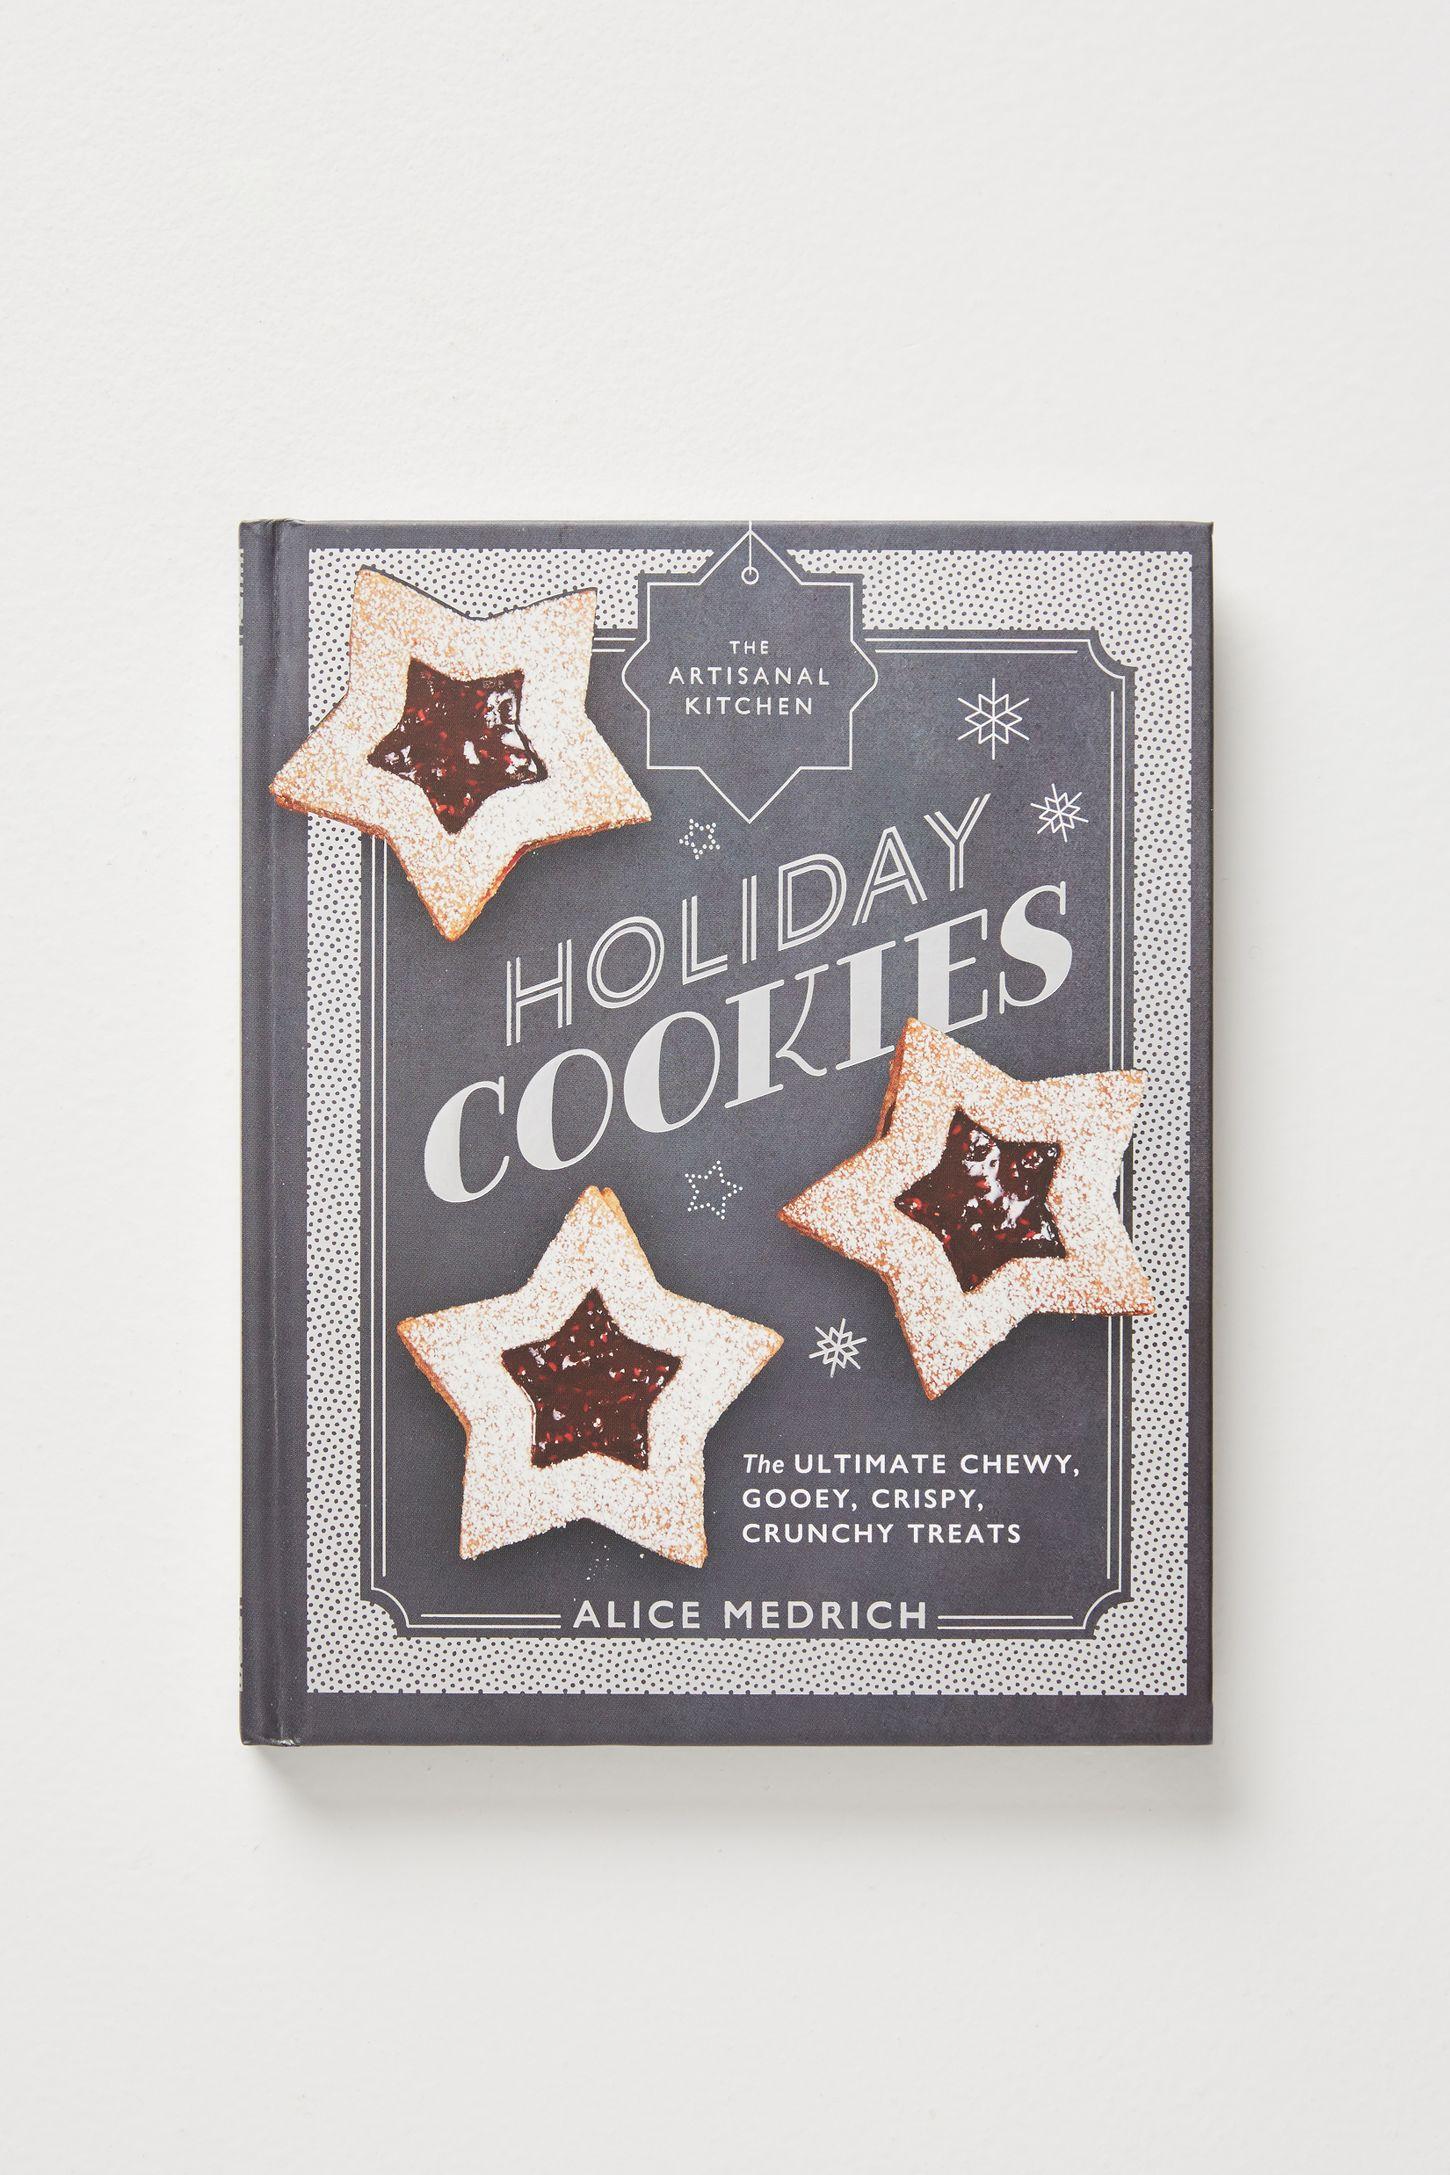 Assorted Books Coffee Table Books & Cookbooks